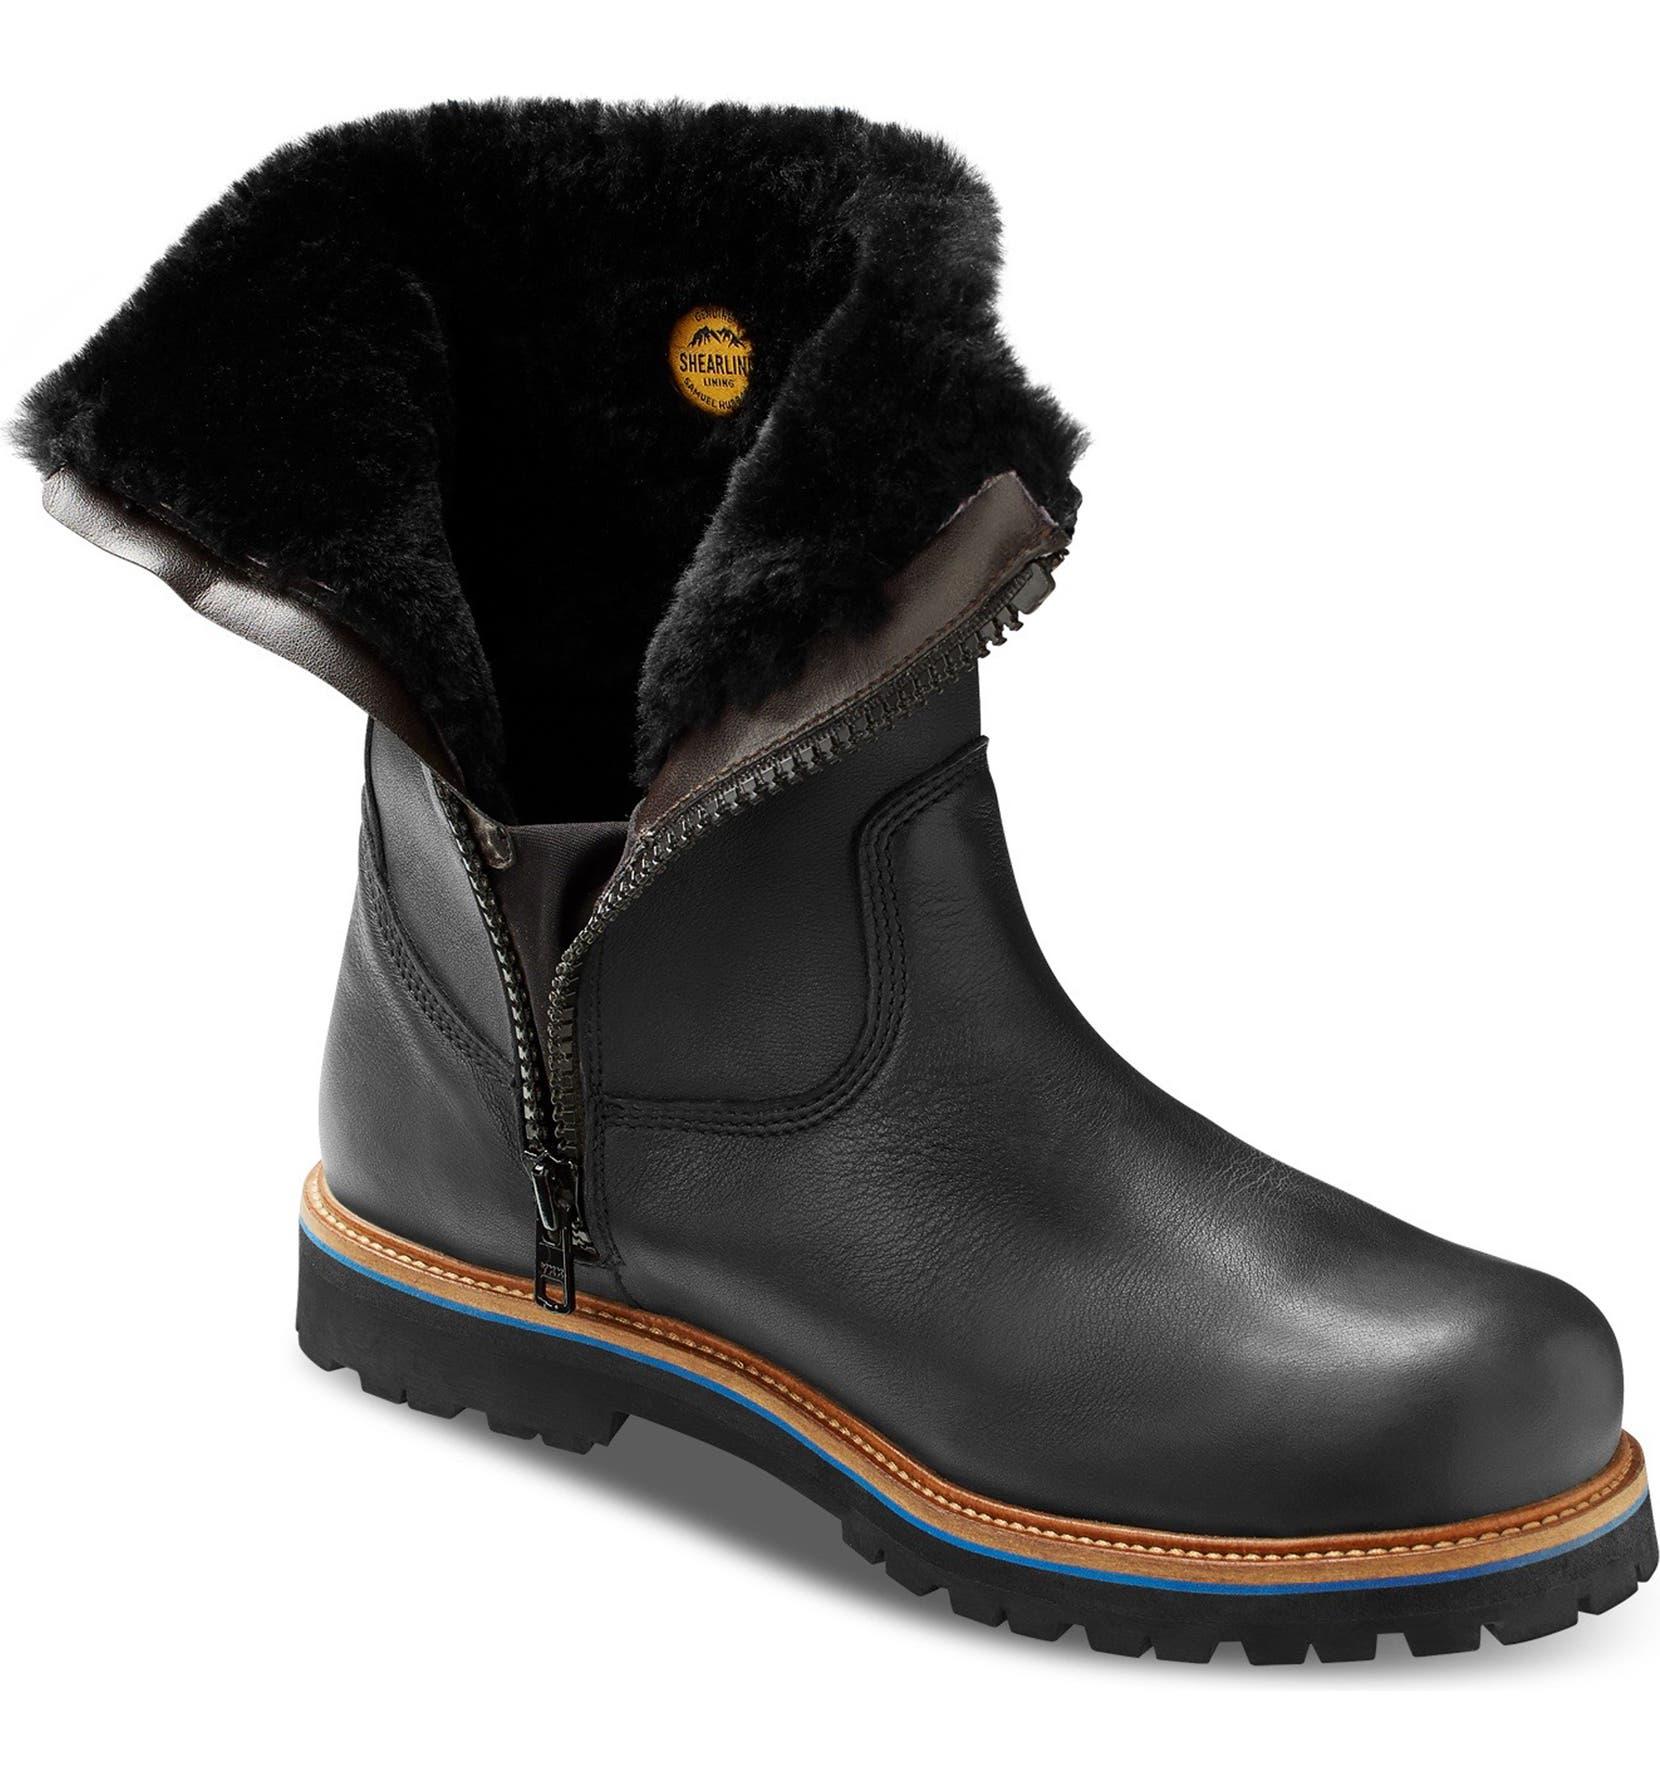 0f461e7a5e7 Snow Lodge Waterproof Gore-Tex® Genuine Shearling Lined Boot